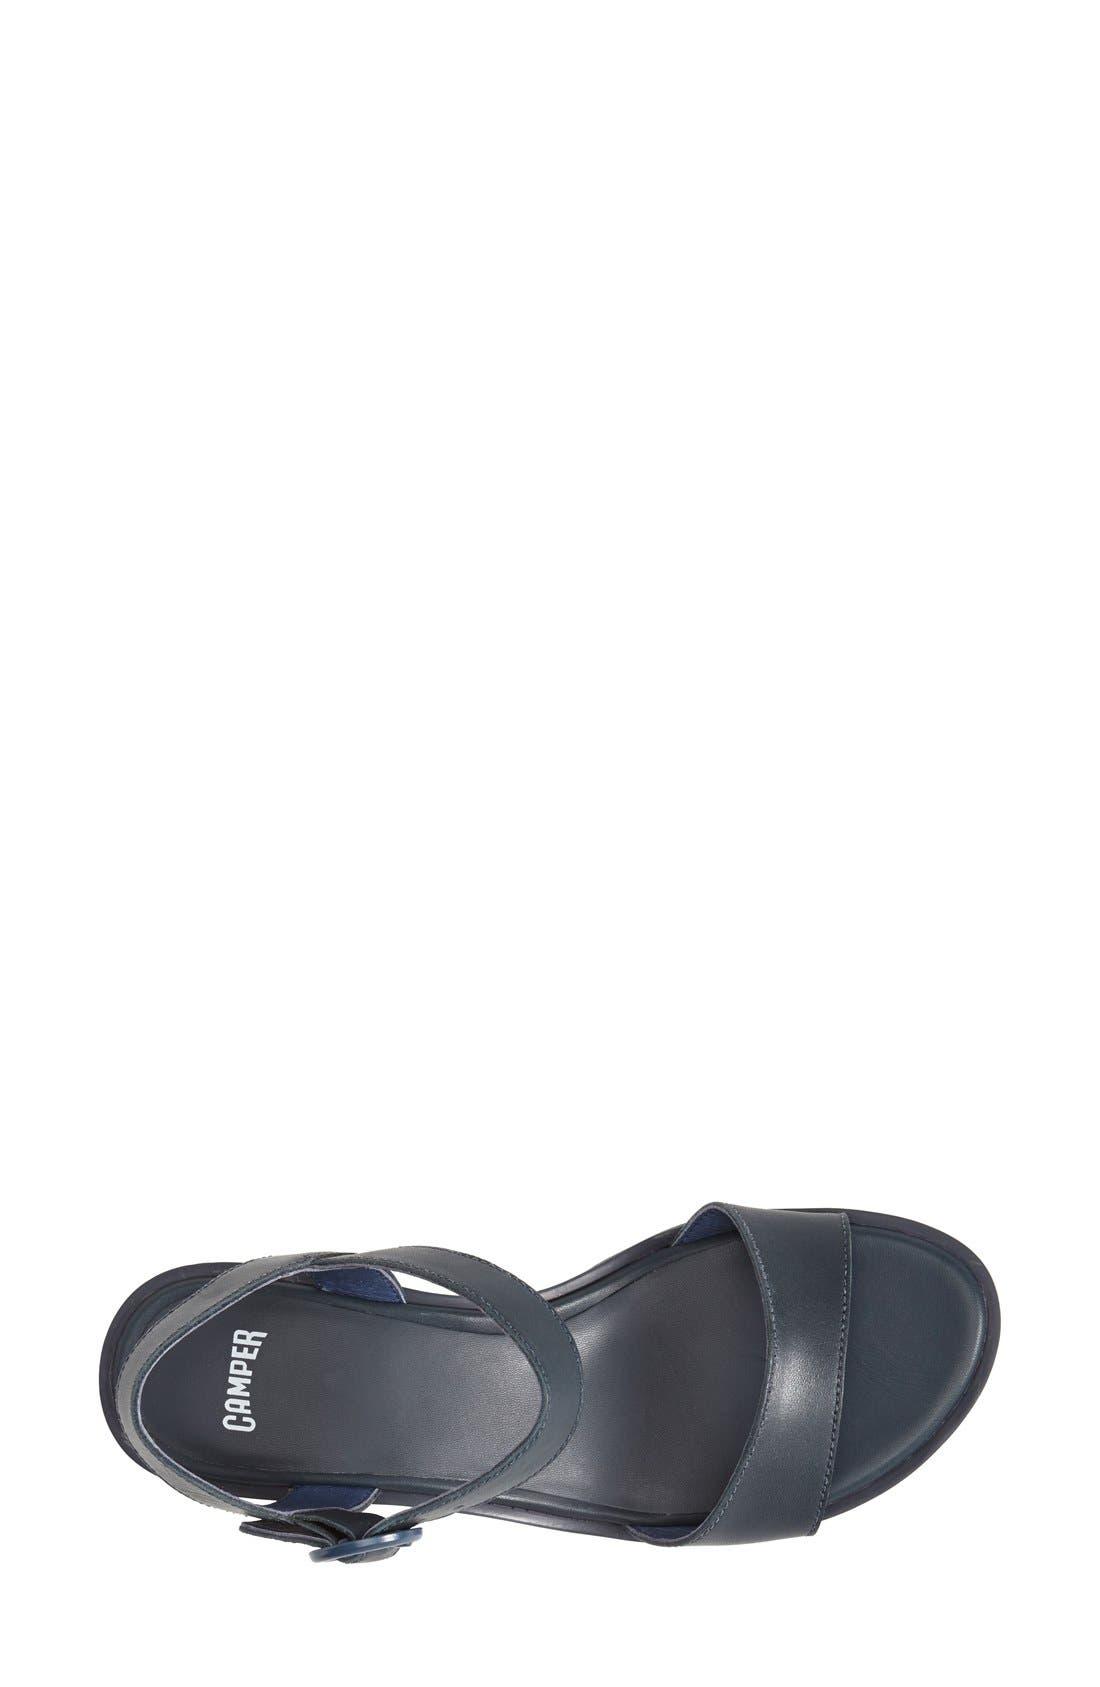 'Damas' Wedge Sandal,                             Alternate thumbnail 21, color,